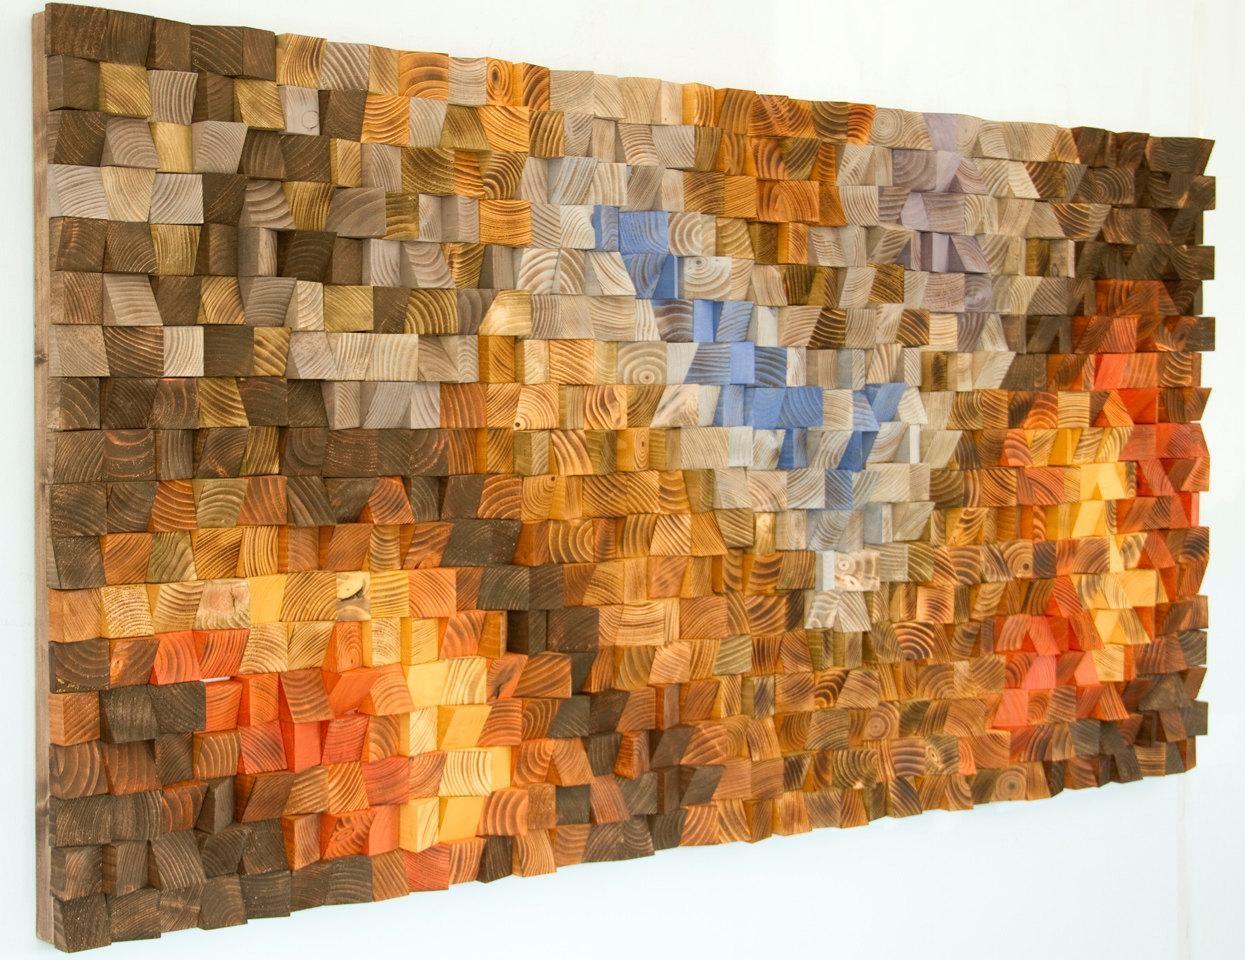 Cream Pixel Art Mosaic Wall Art Reclaimed Wood And Italian Glass Pertaining To Italian Wood Wall Art (Image 11 of 20)